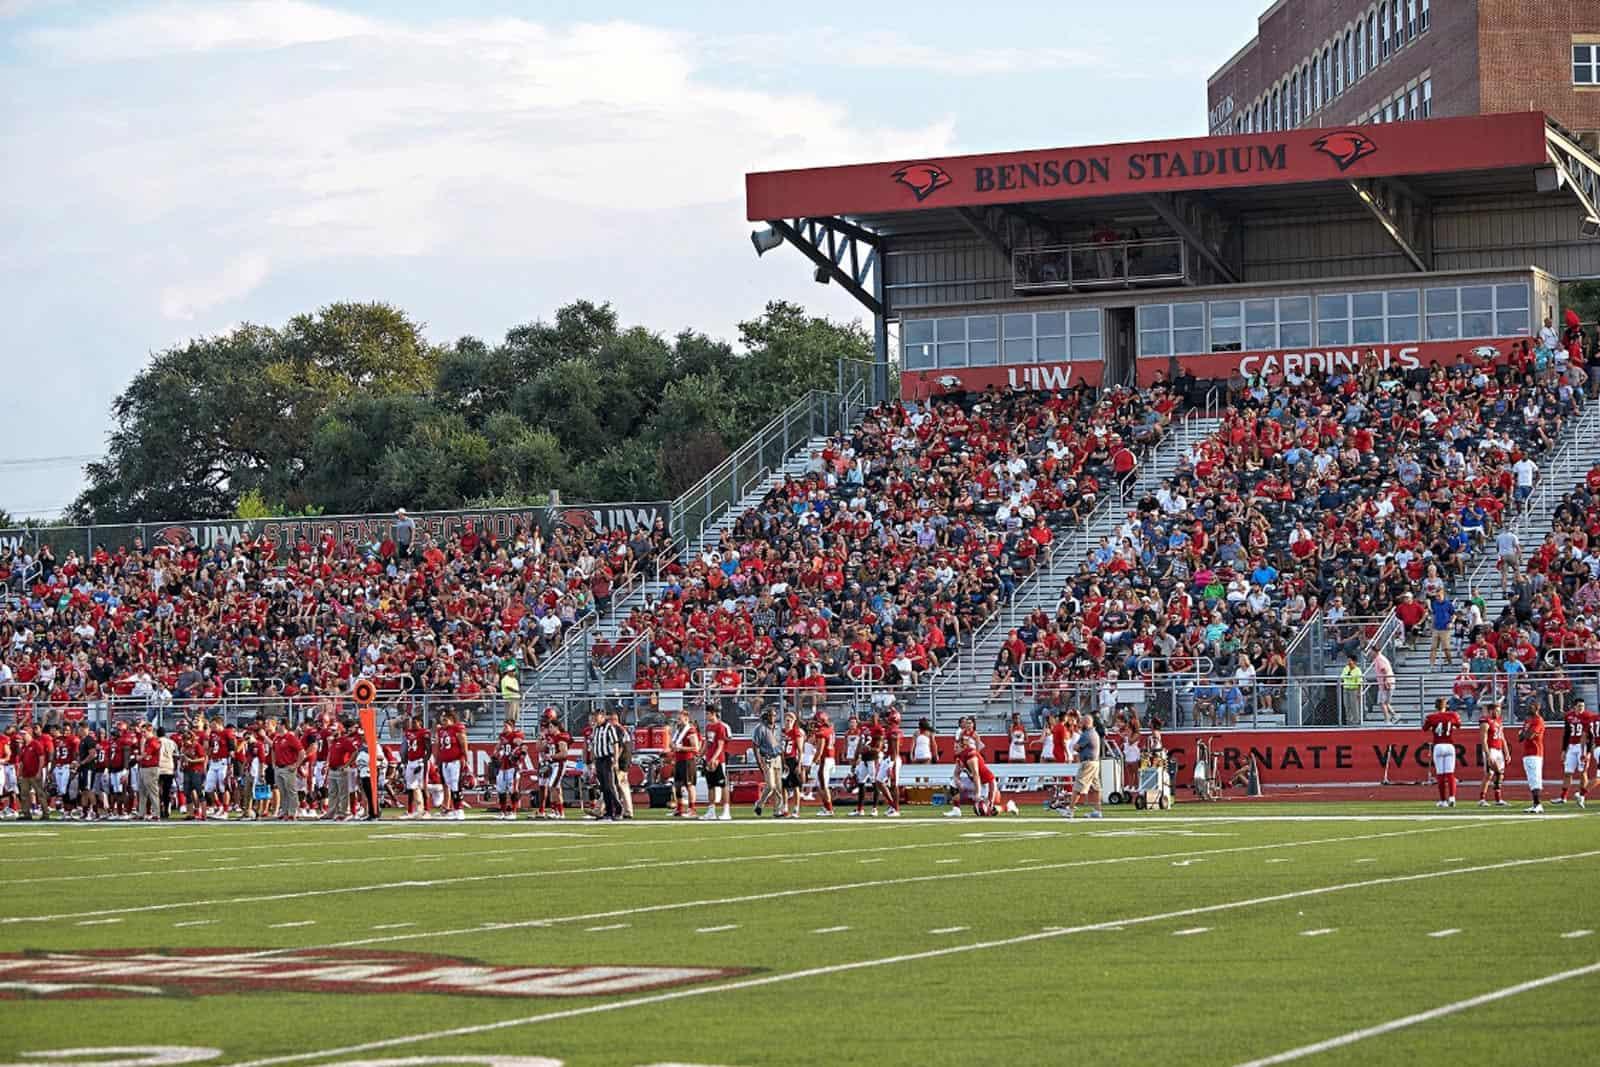 Benson Stadium